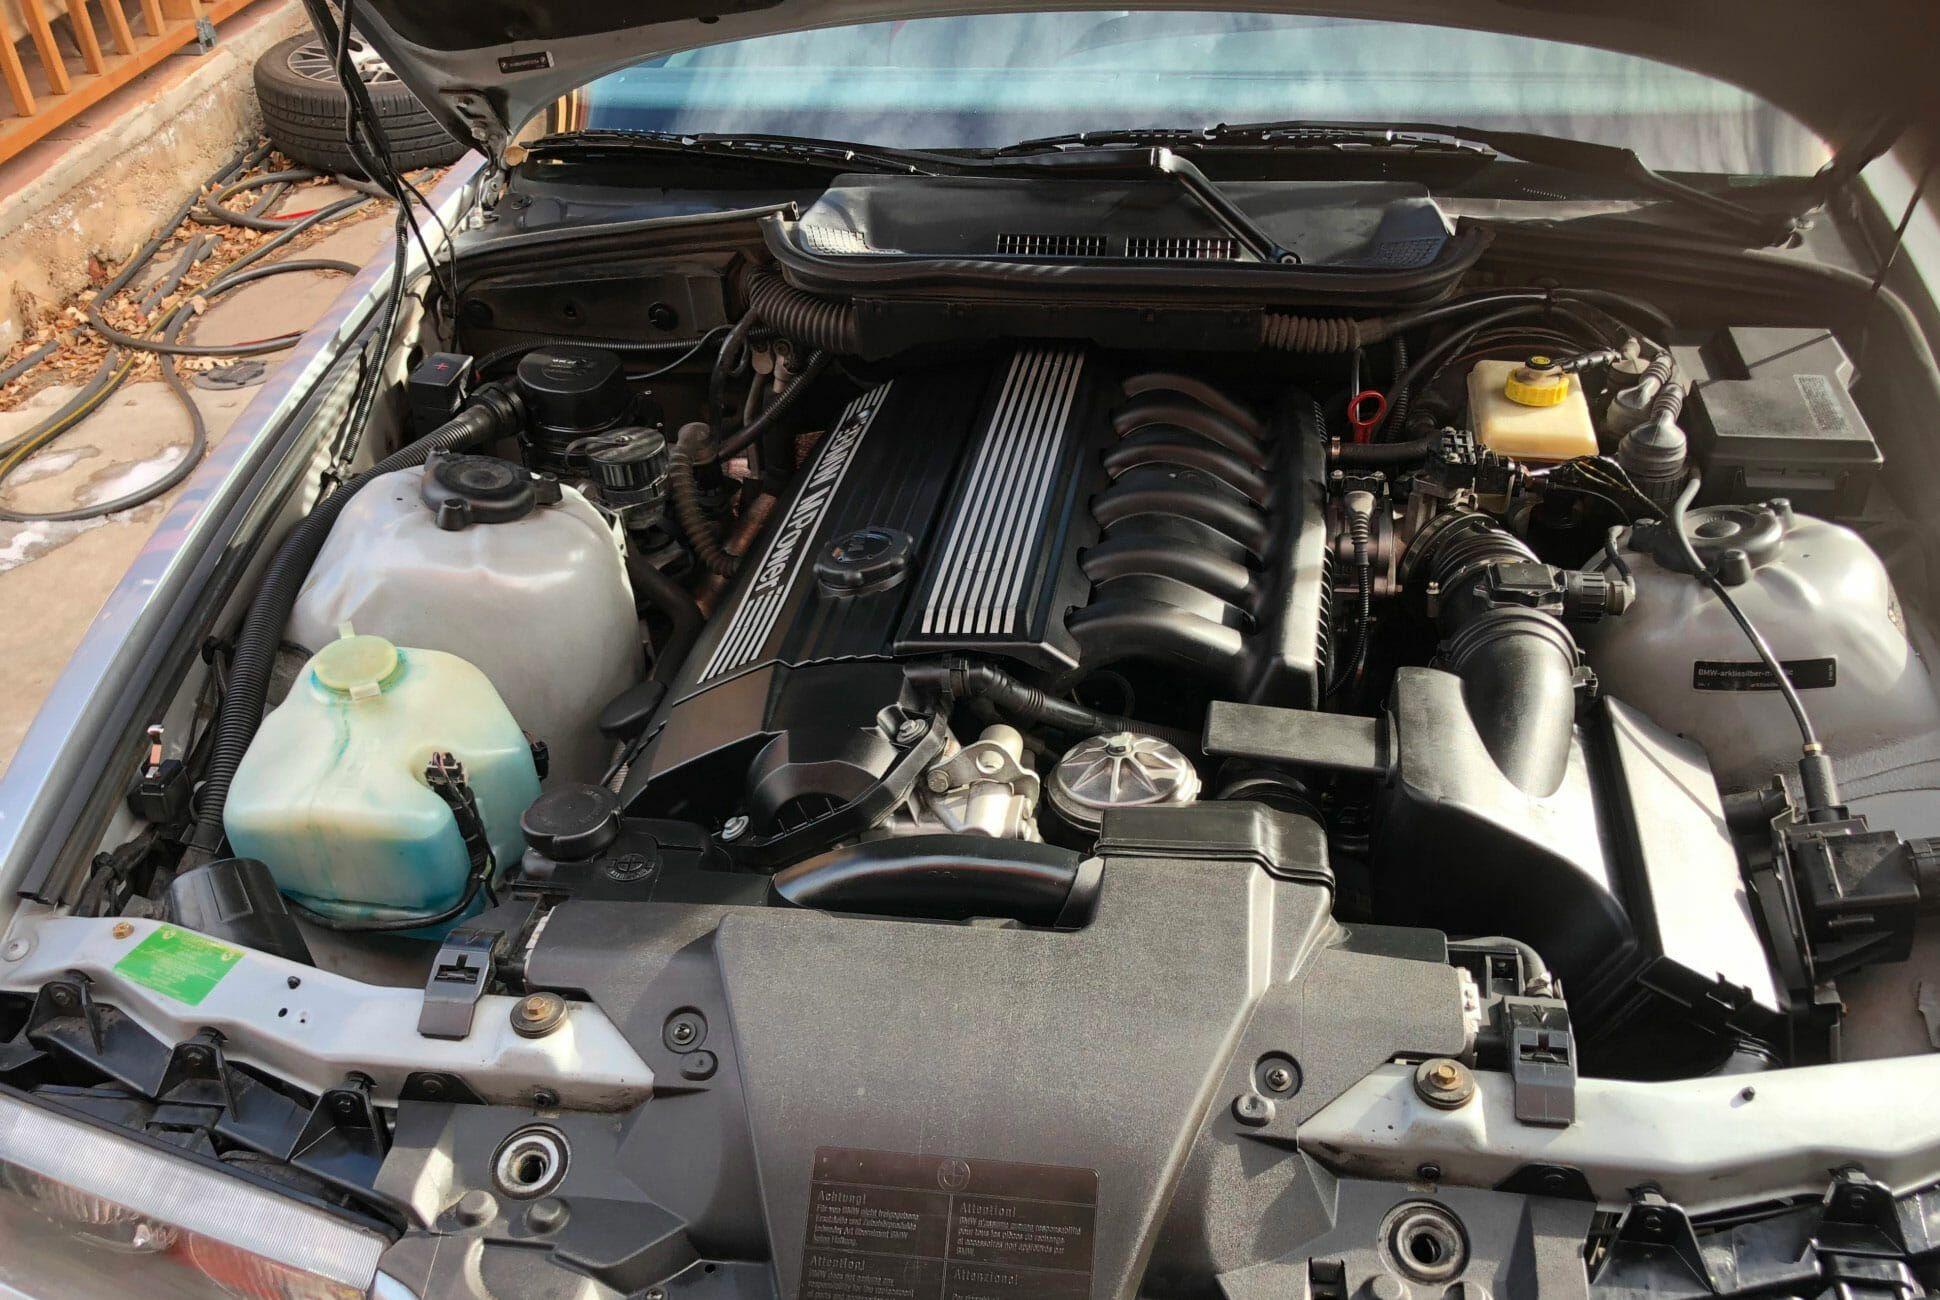 1996-BMW-M3-Coupe-5-Speed-gear-patrol-slide-06